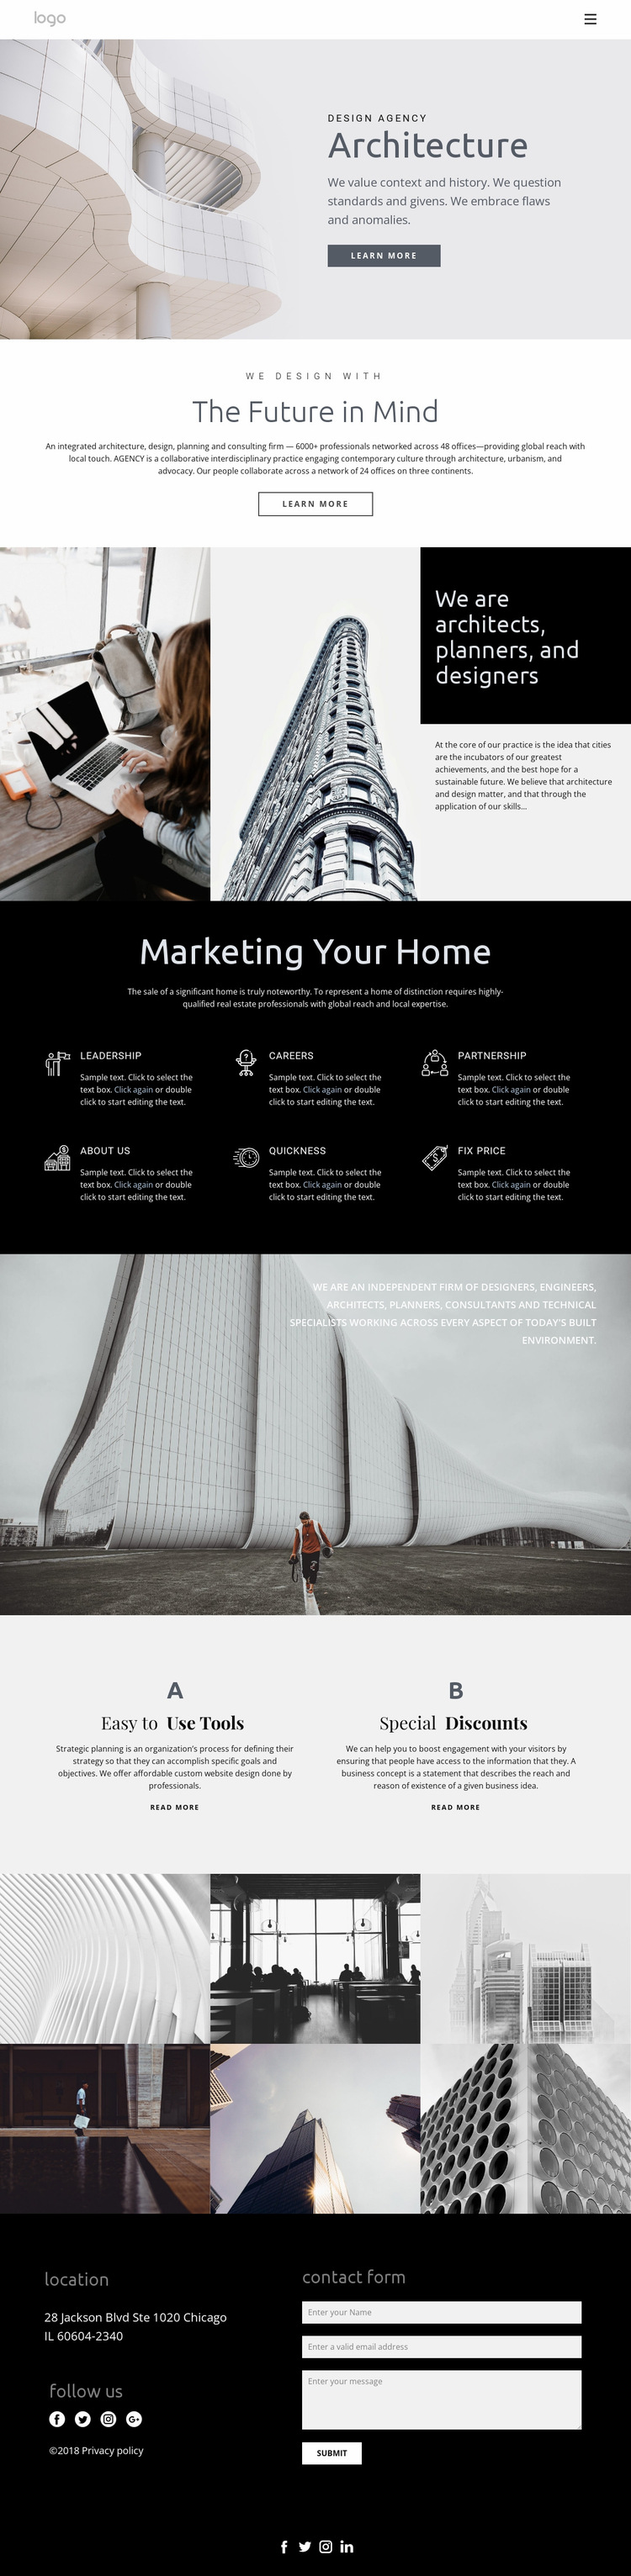 Constructive architecture Website Builder